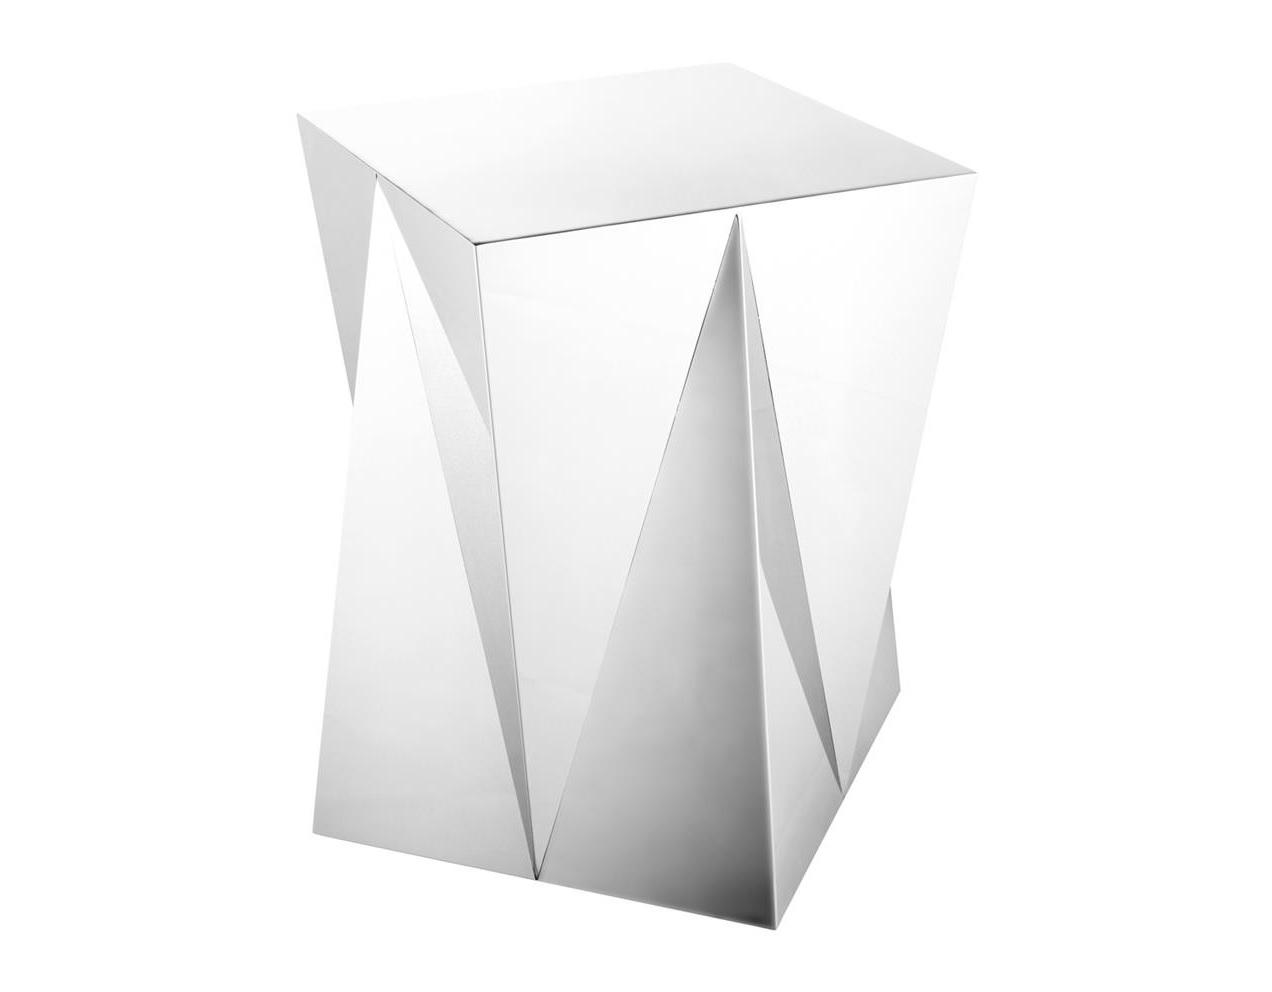 Столик Side Table HelvetiaПриставные столики<br><br><br>Material: Сталь<br>Width см: 44<br>Depth см: 44<br>Height см: 45